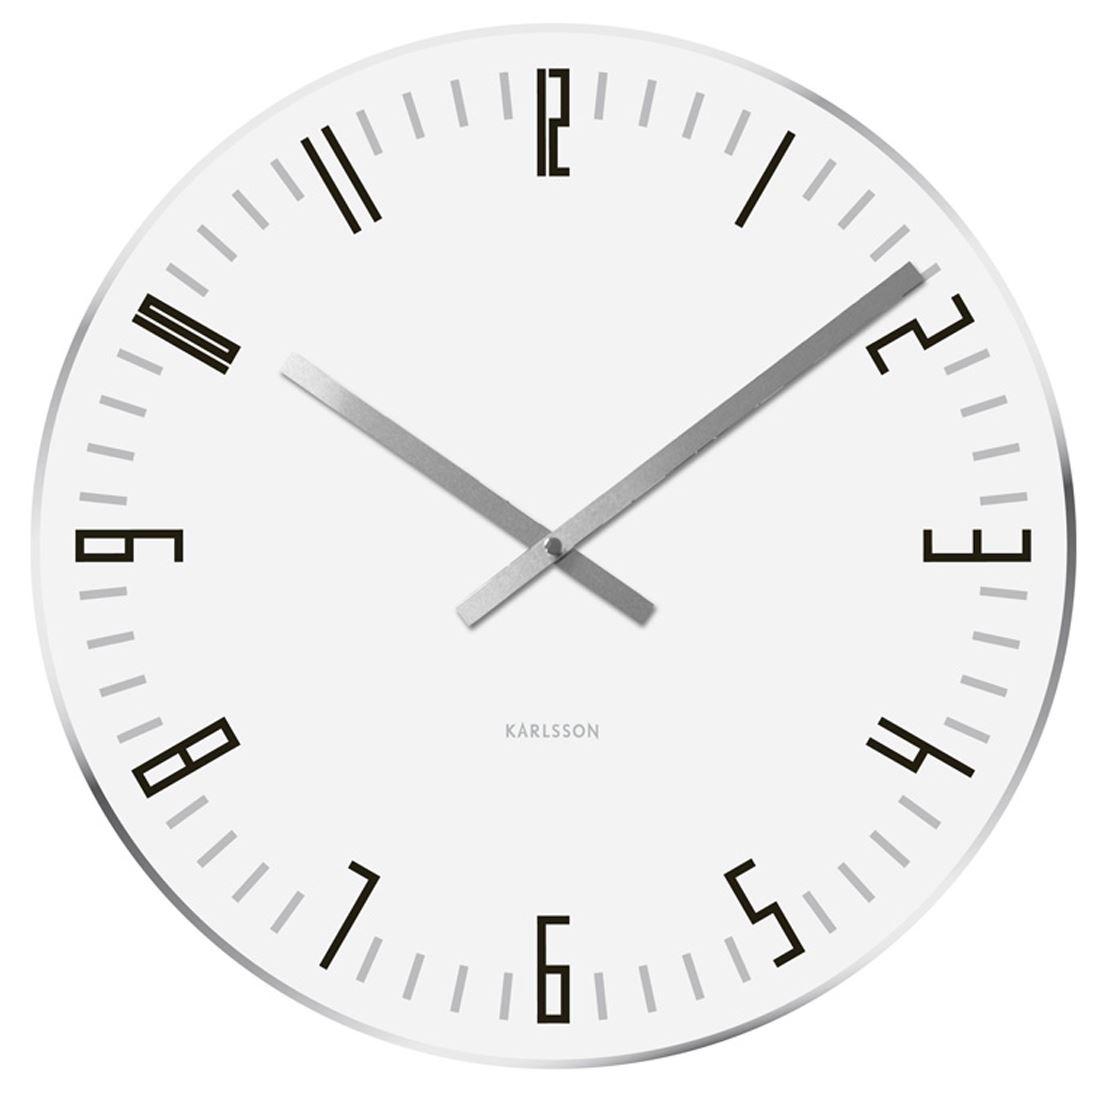 Karlsson slim glass mirror edge 40cm wall clock in black or white karlsson slim glass mirror edge 40cm wall clock amipublicfo Images